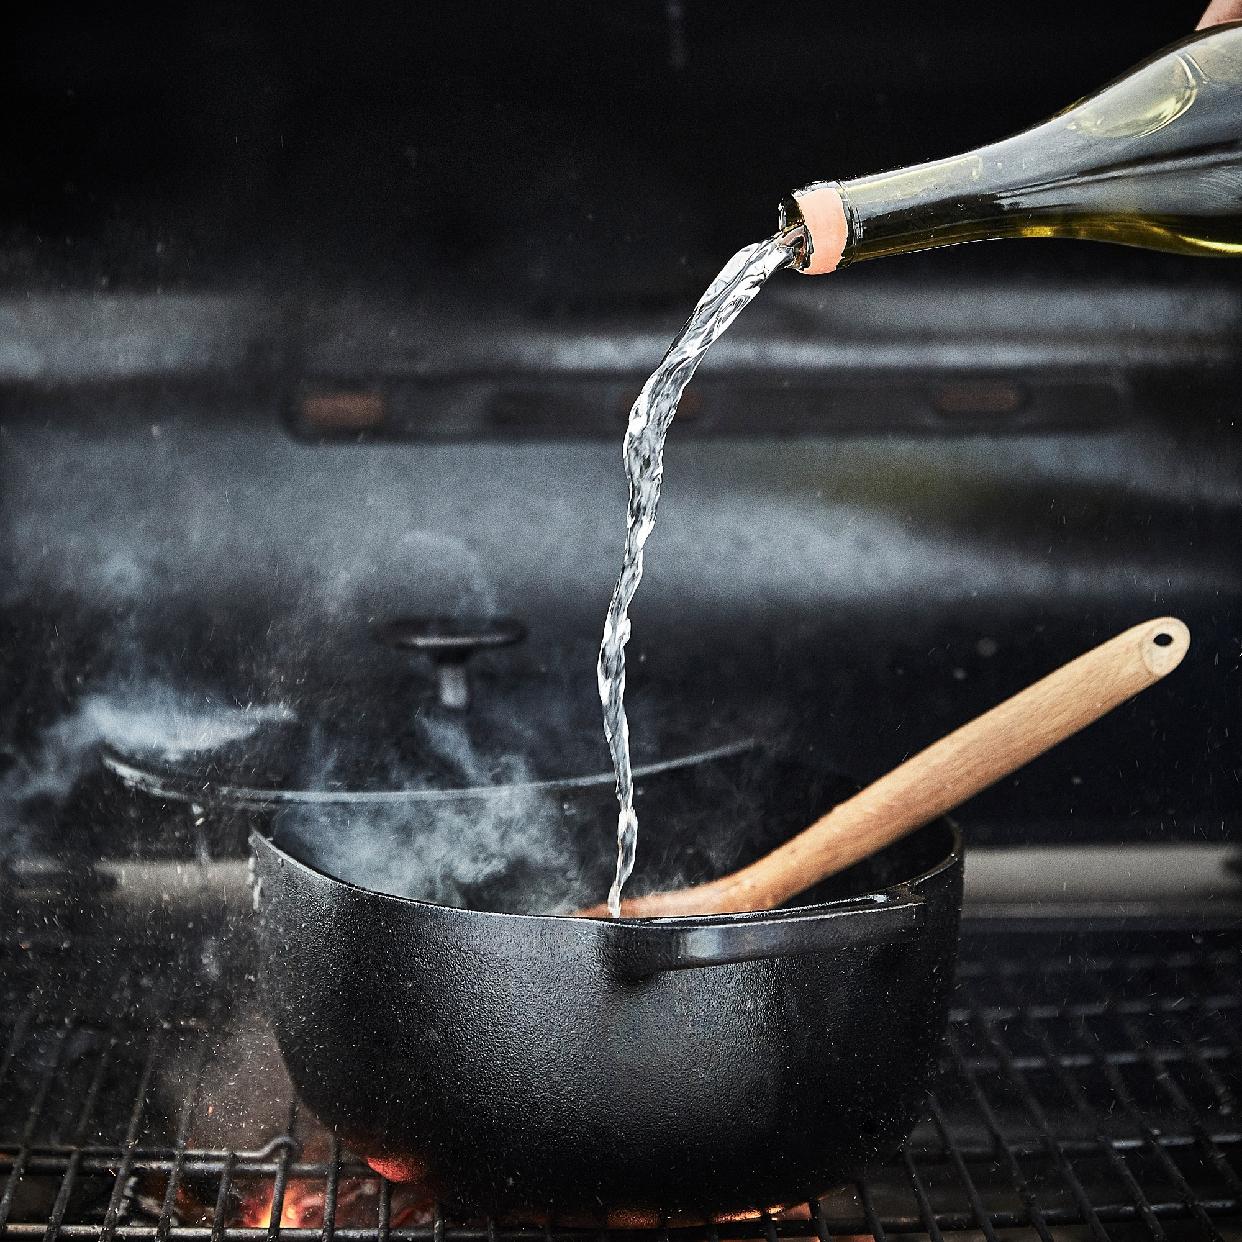 IKEA(イケア) ヴァルダーゲン キャセロール鍋の商品画像11